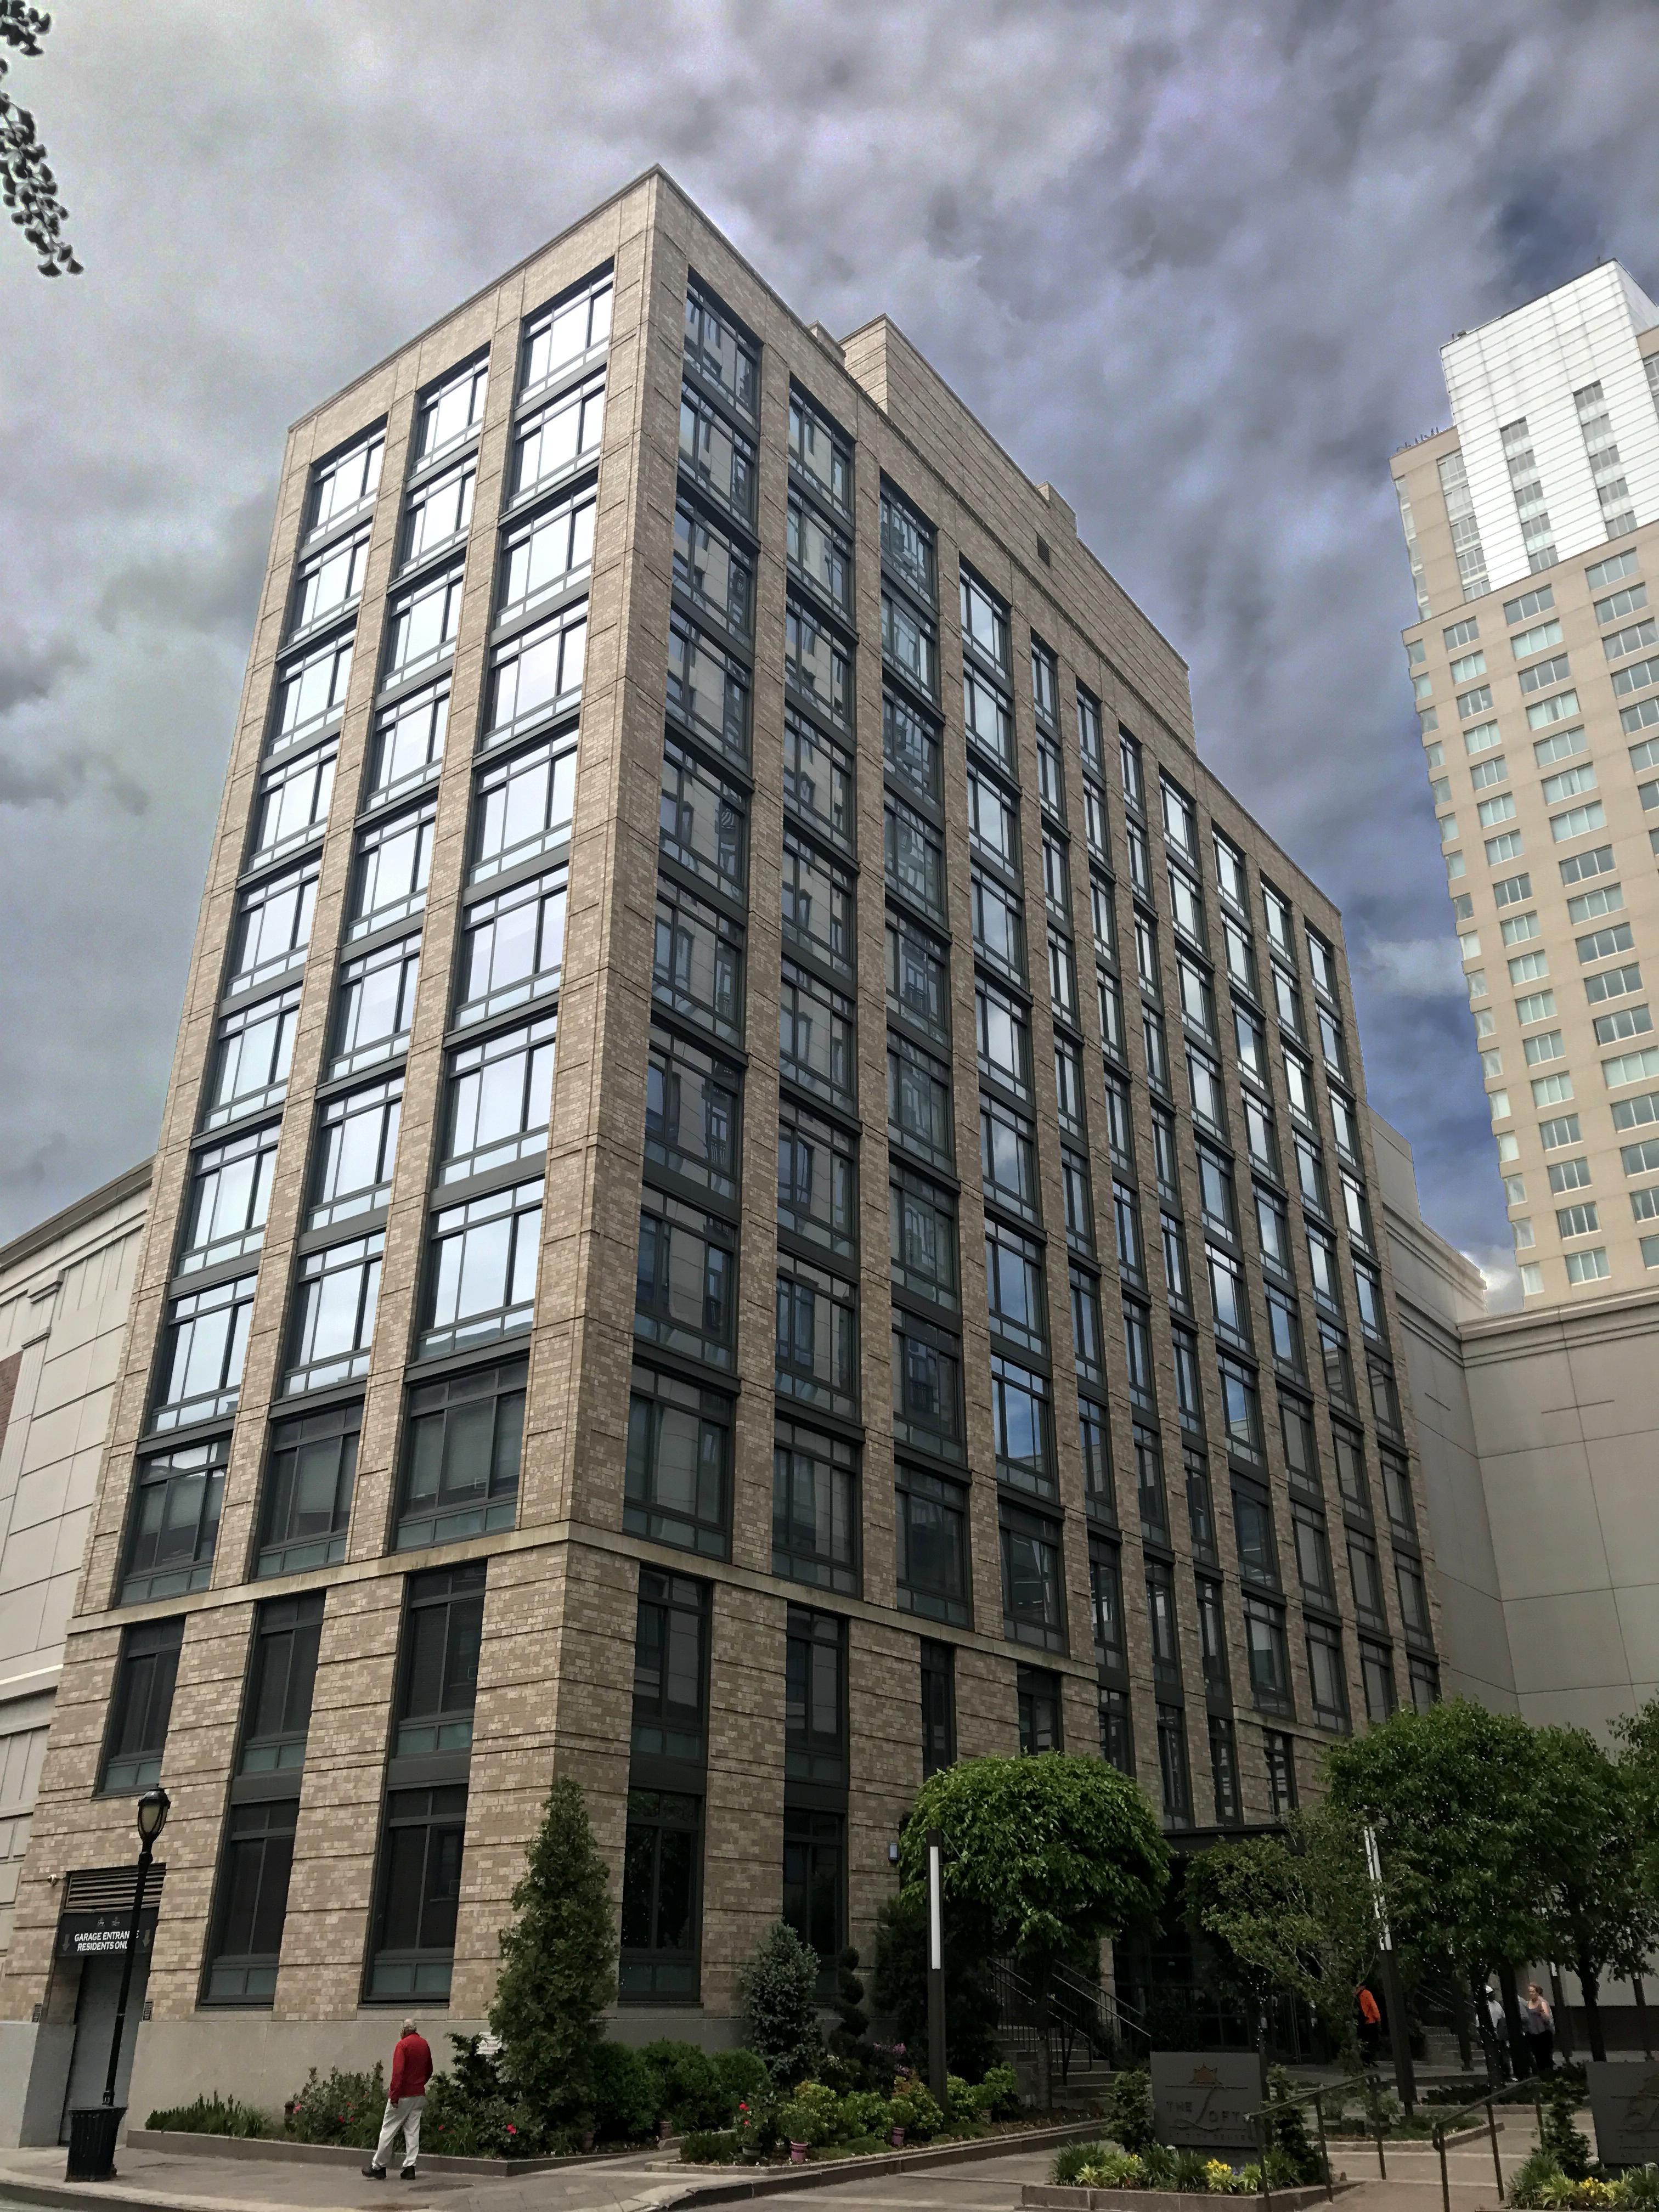 The Lofts at City Center